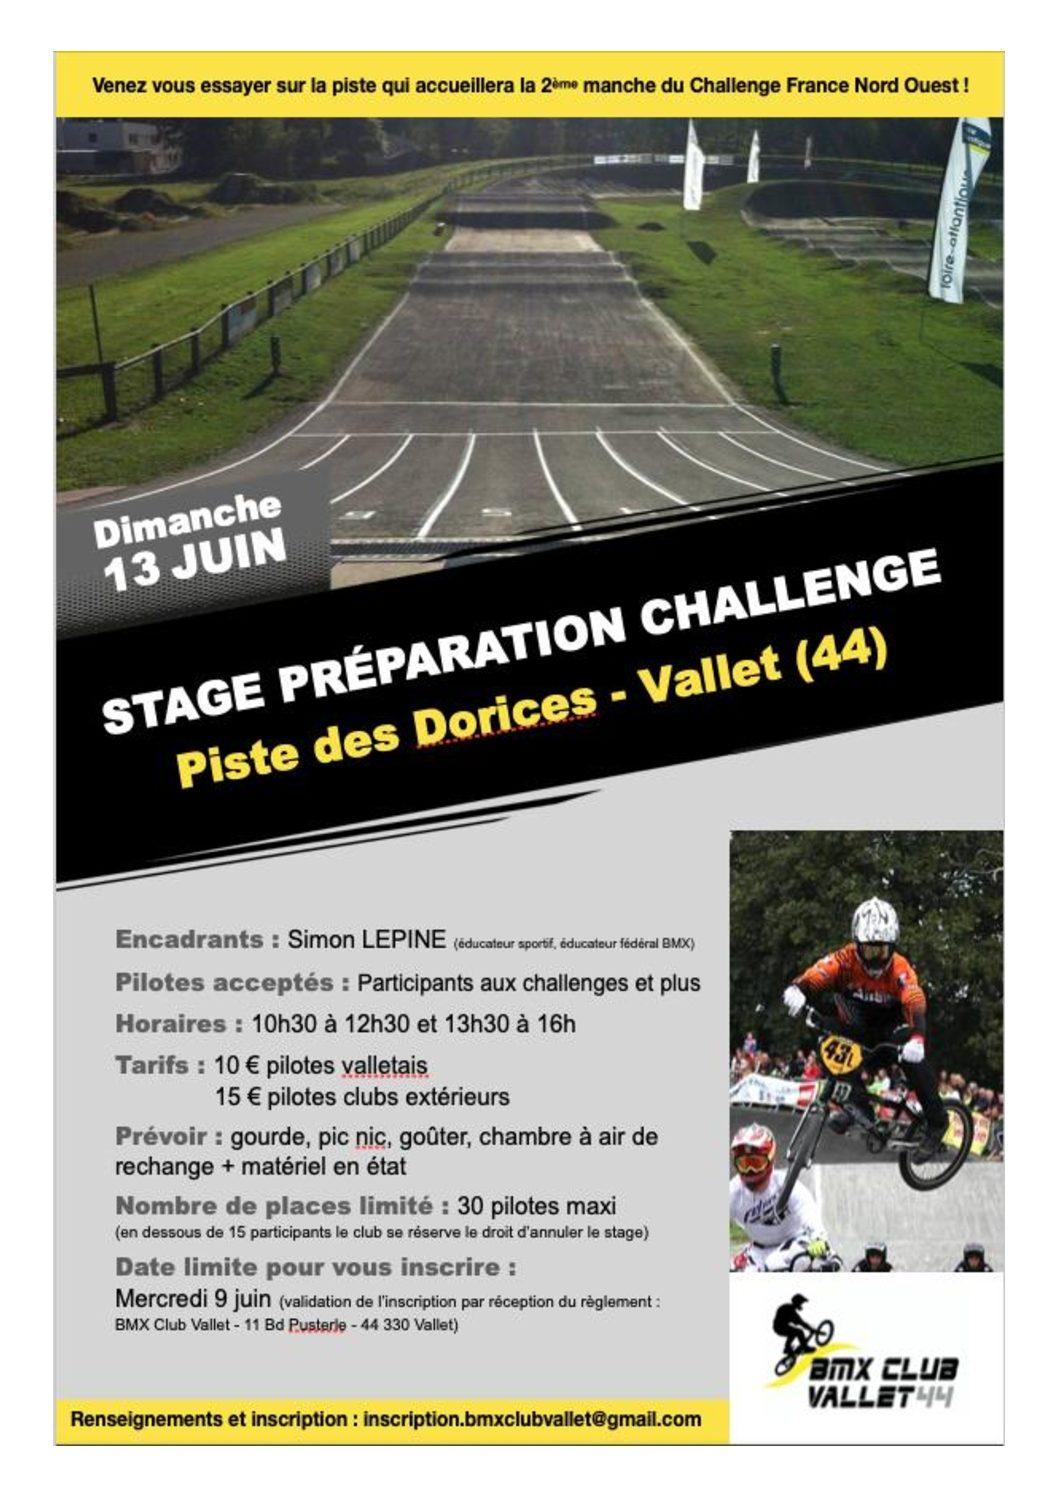 Stage préparation challenge Vallet